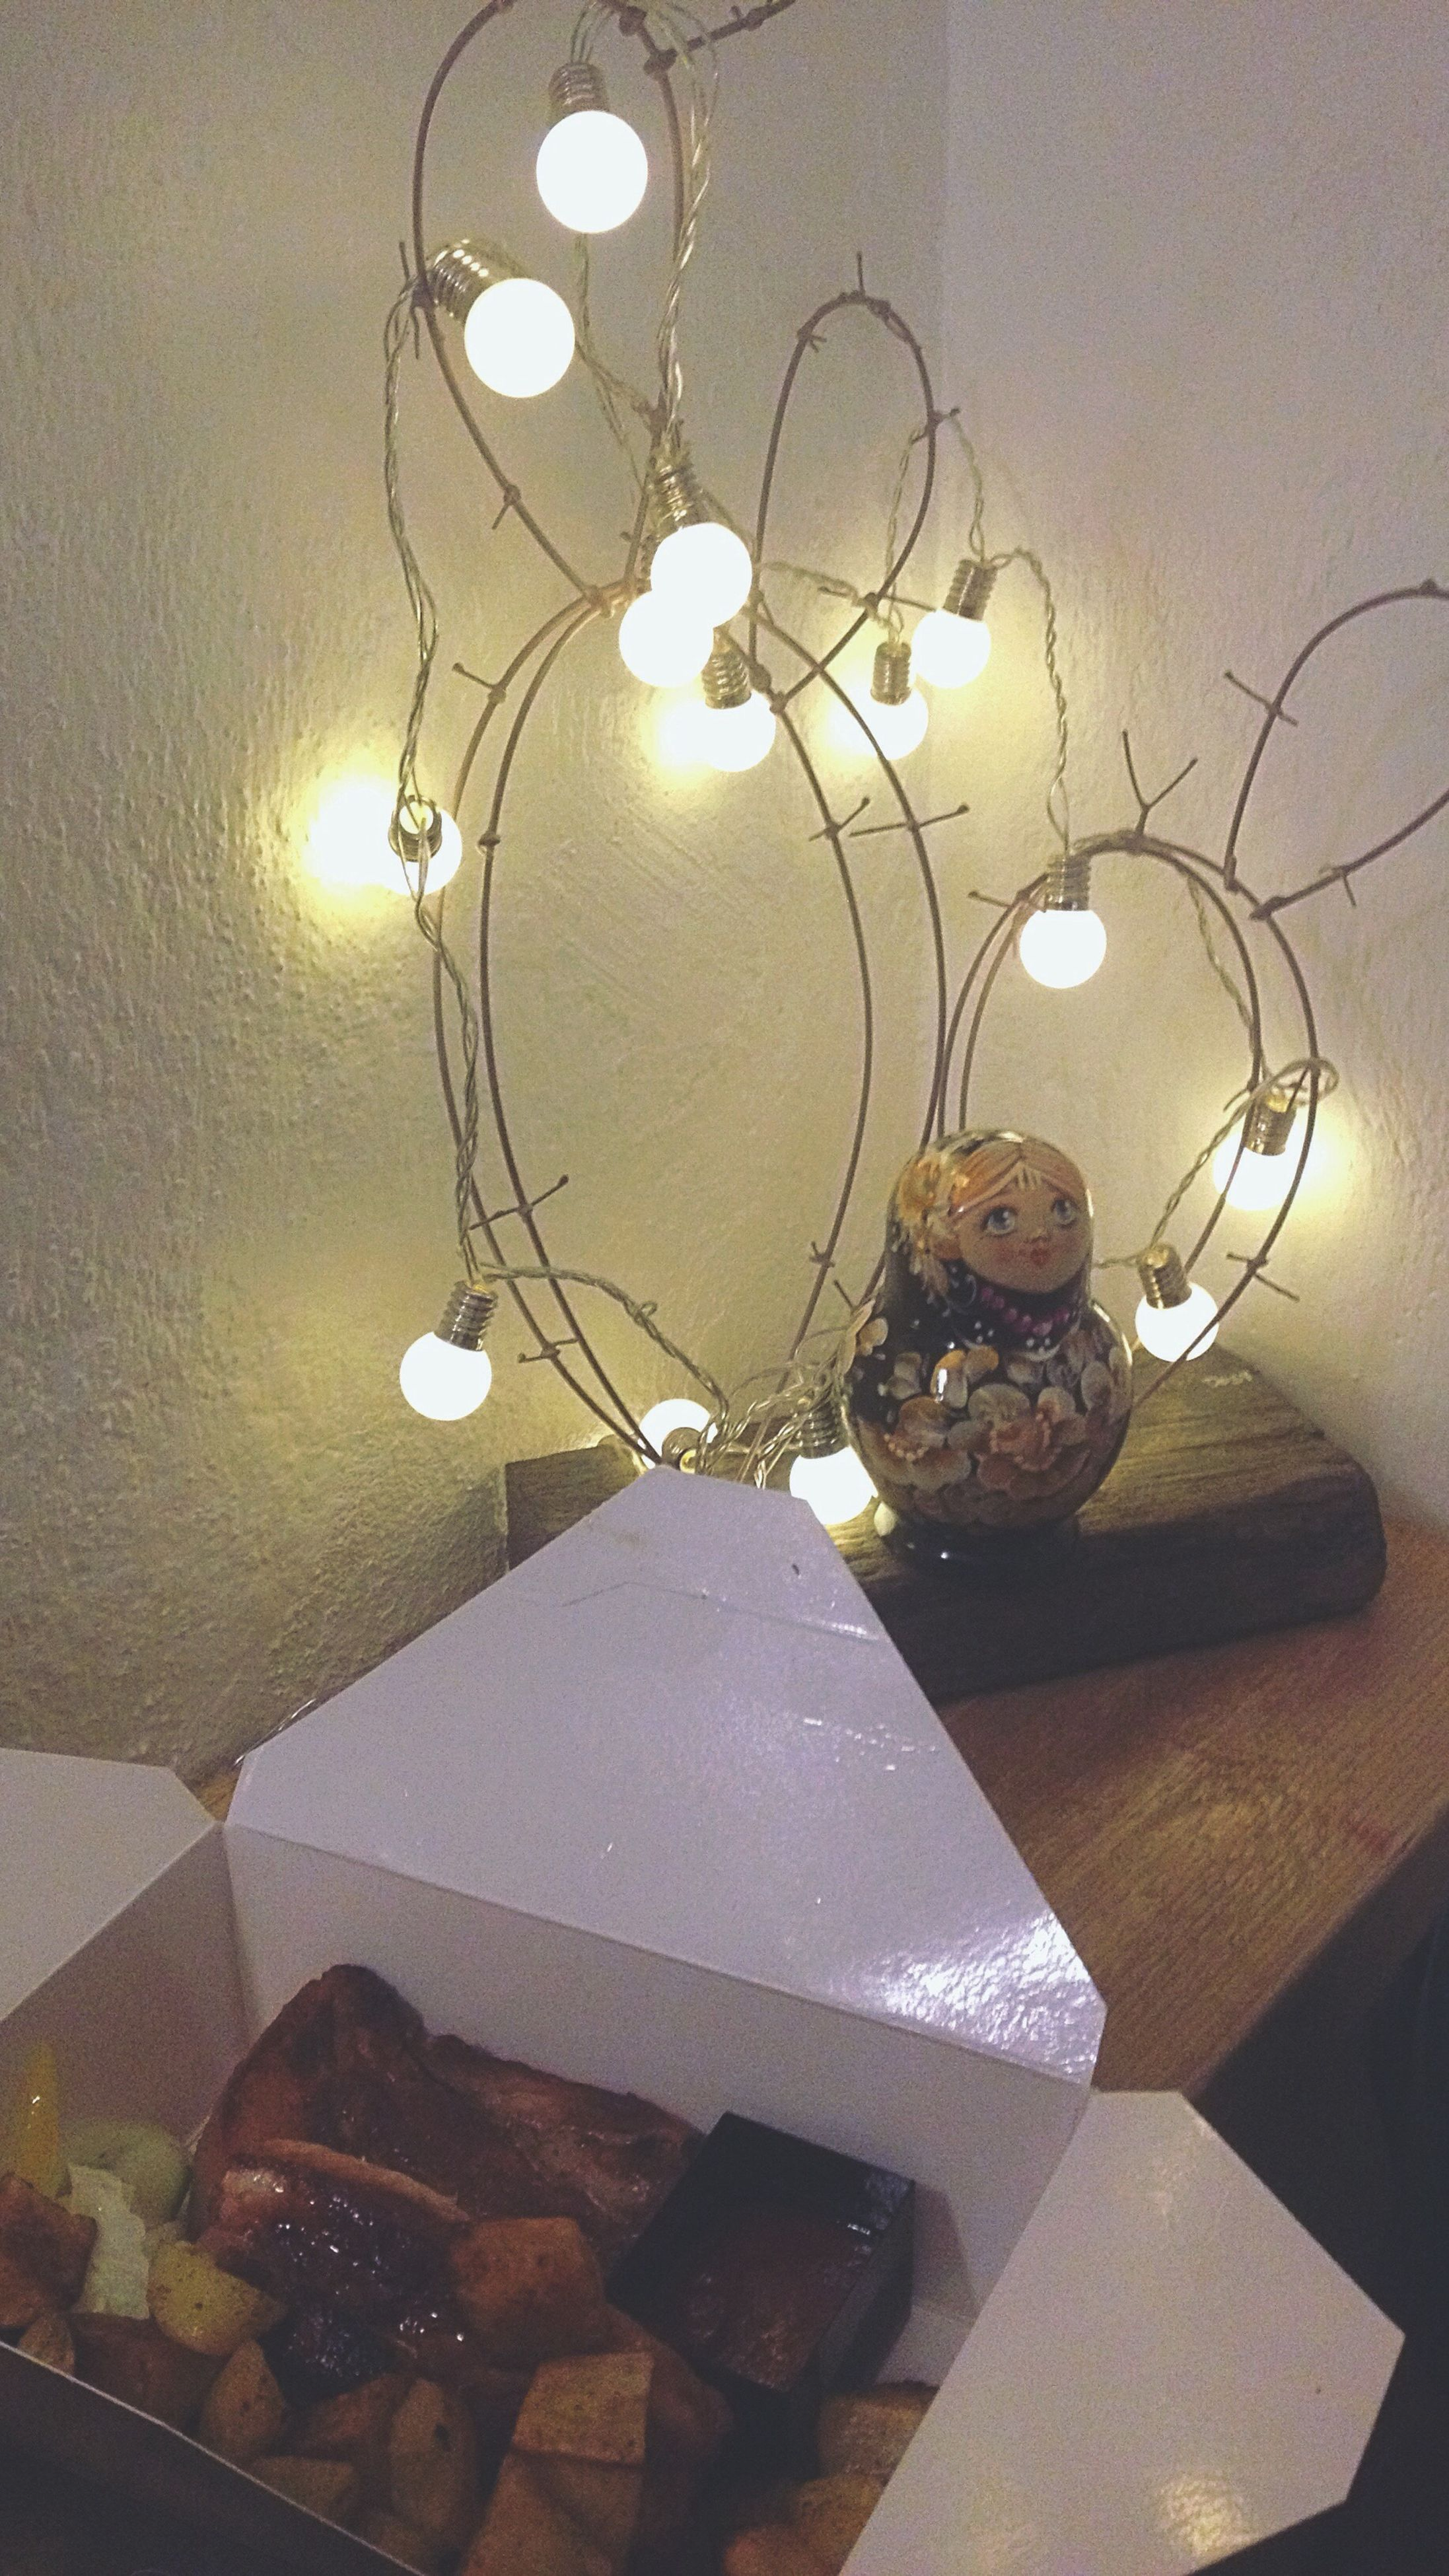 illuminated, indoors, lighting equipment, decoration, electricity, electric light, reflection, glowing, decor, circle, man made object, no people, lit, geometric shape